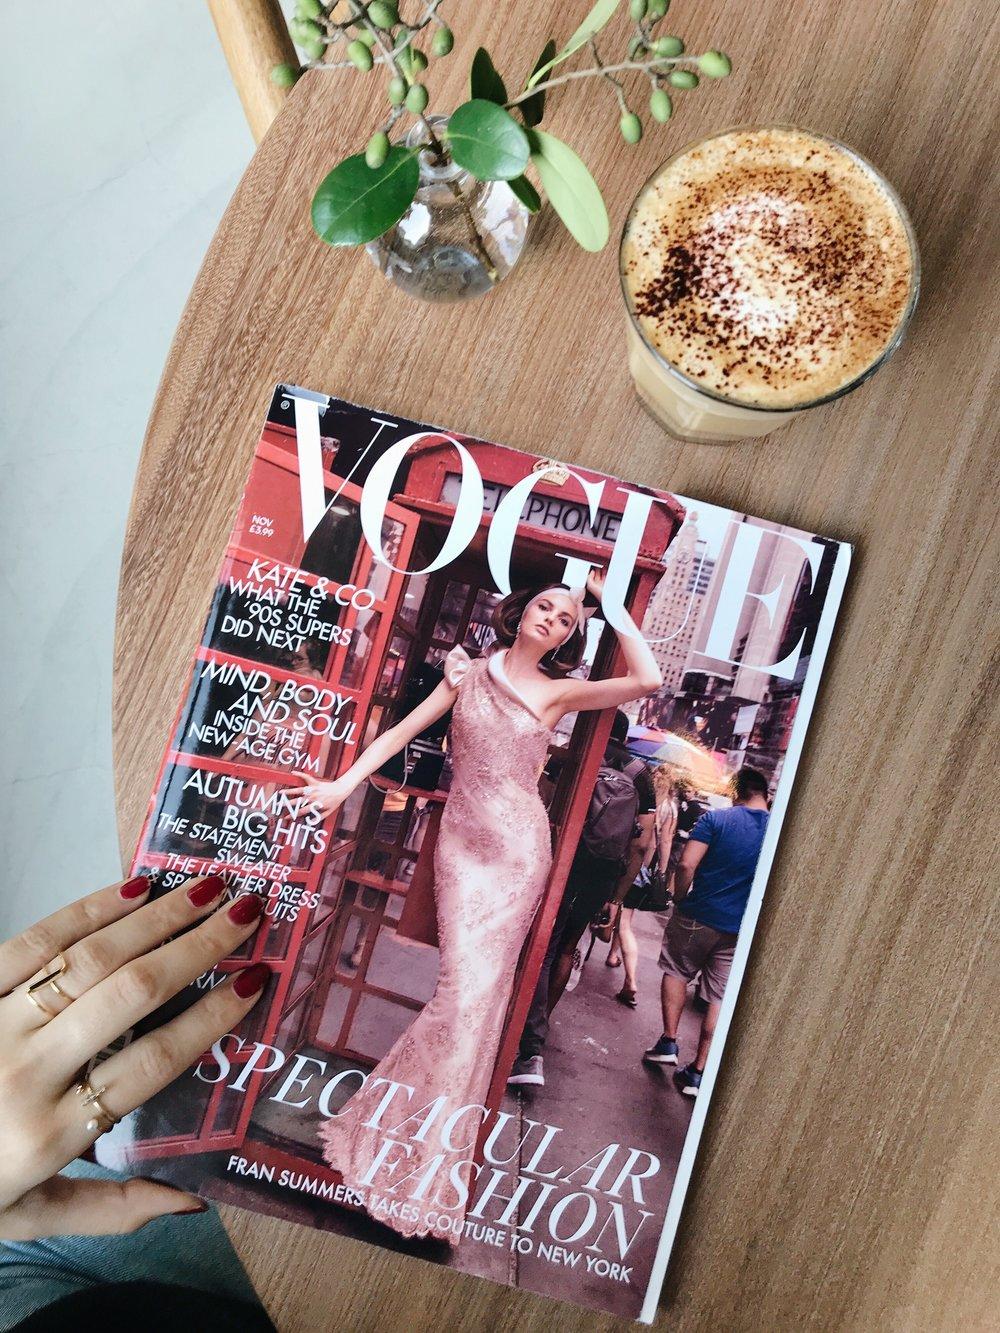 IMWIM British Vogue Nov Issue Designer Profile Cover.jpg